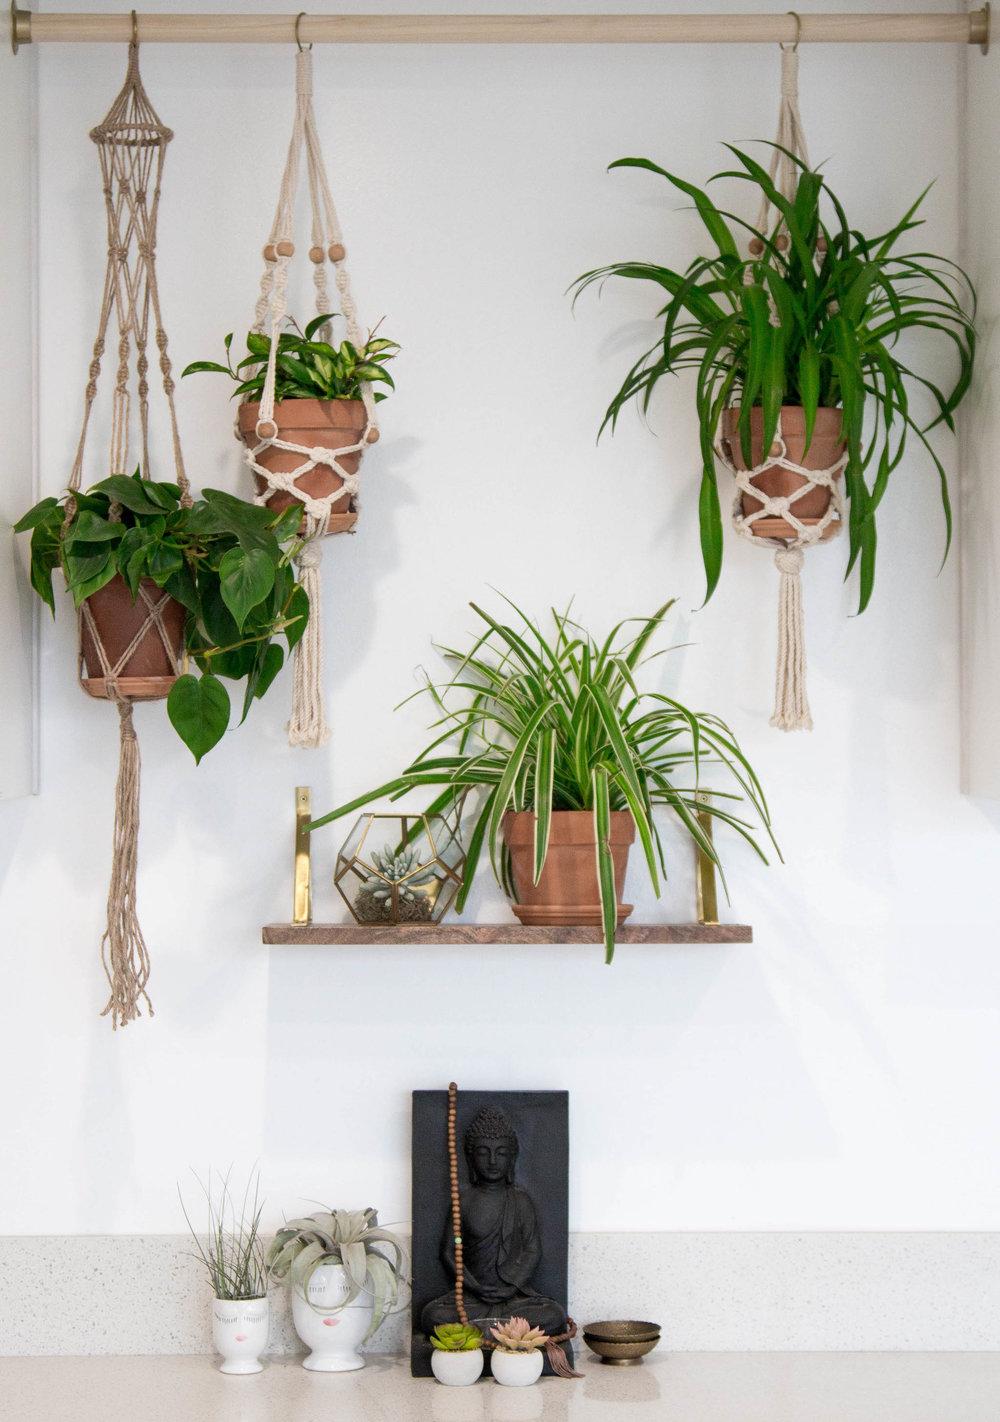 the-cosmo-studio-dolkii-plant-styling-shaiyanne-dar-5.jpg